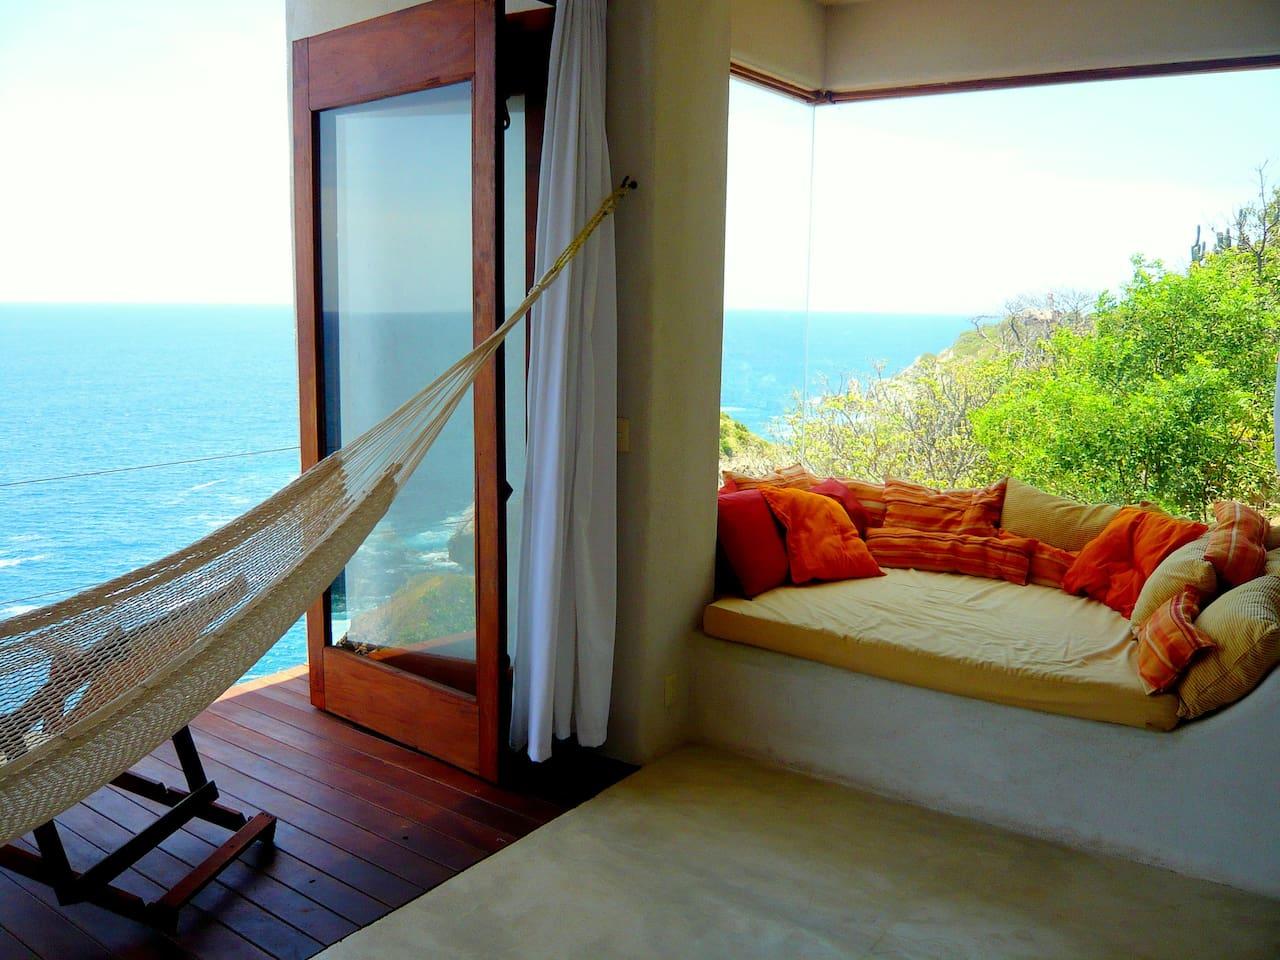 Sea view loft